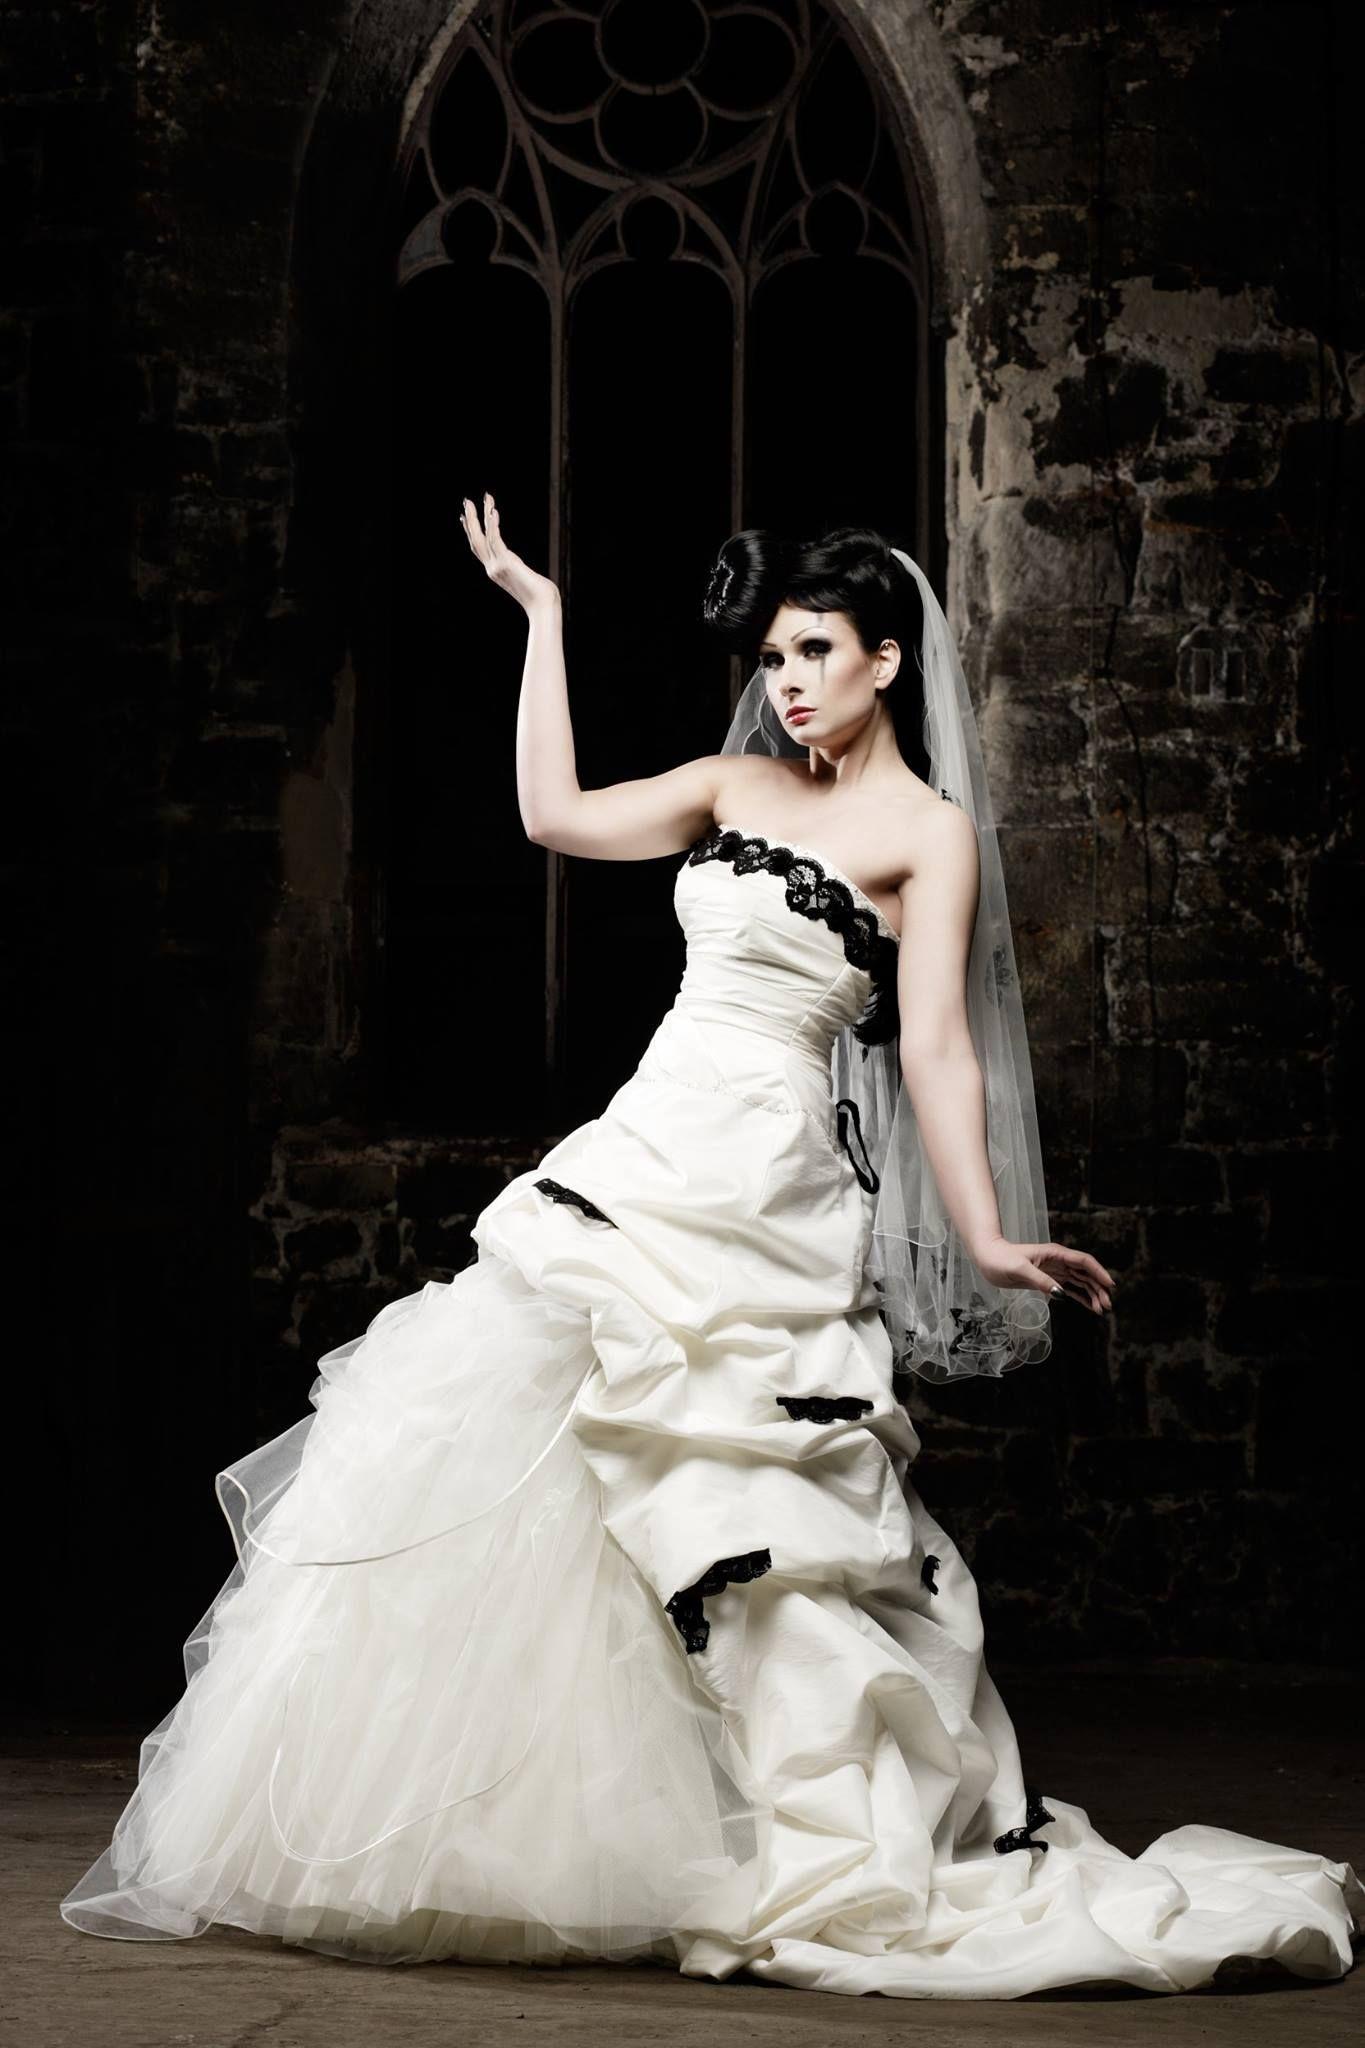 White Wedding Dress With Black Ornaments Dark Romantic Gothic